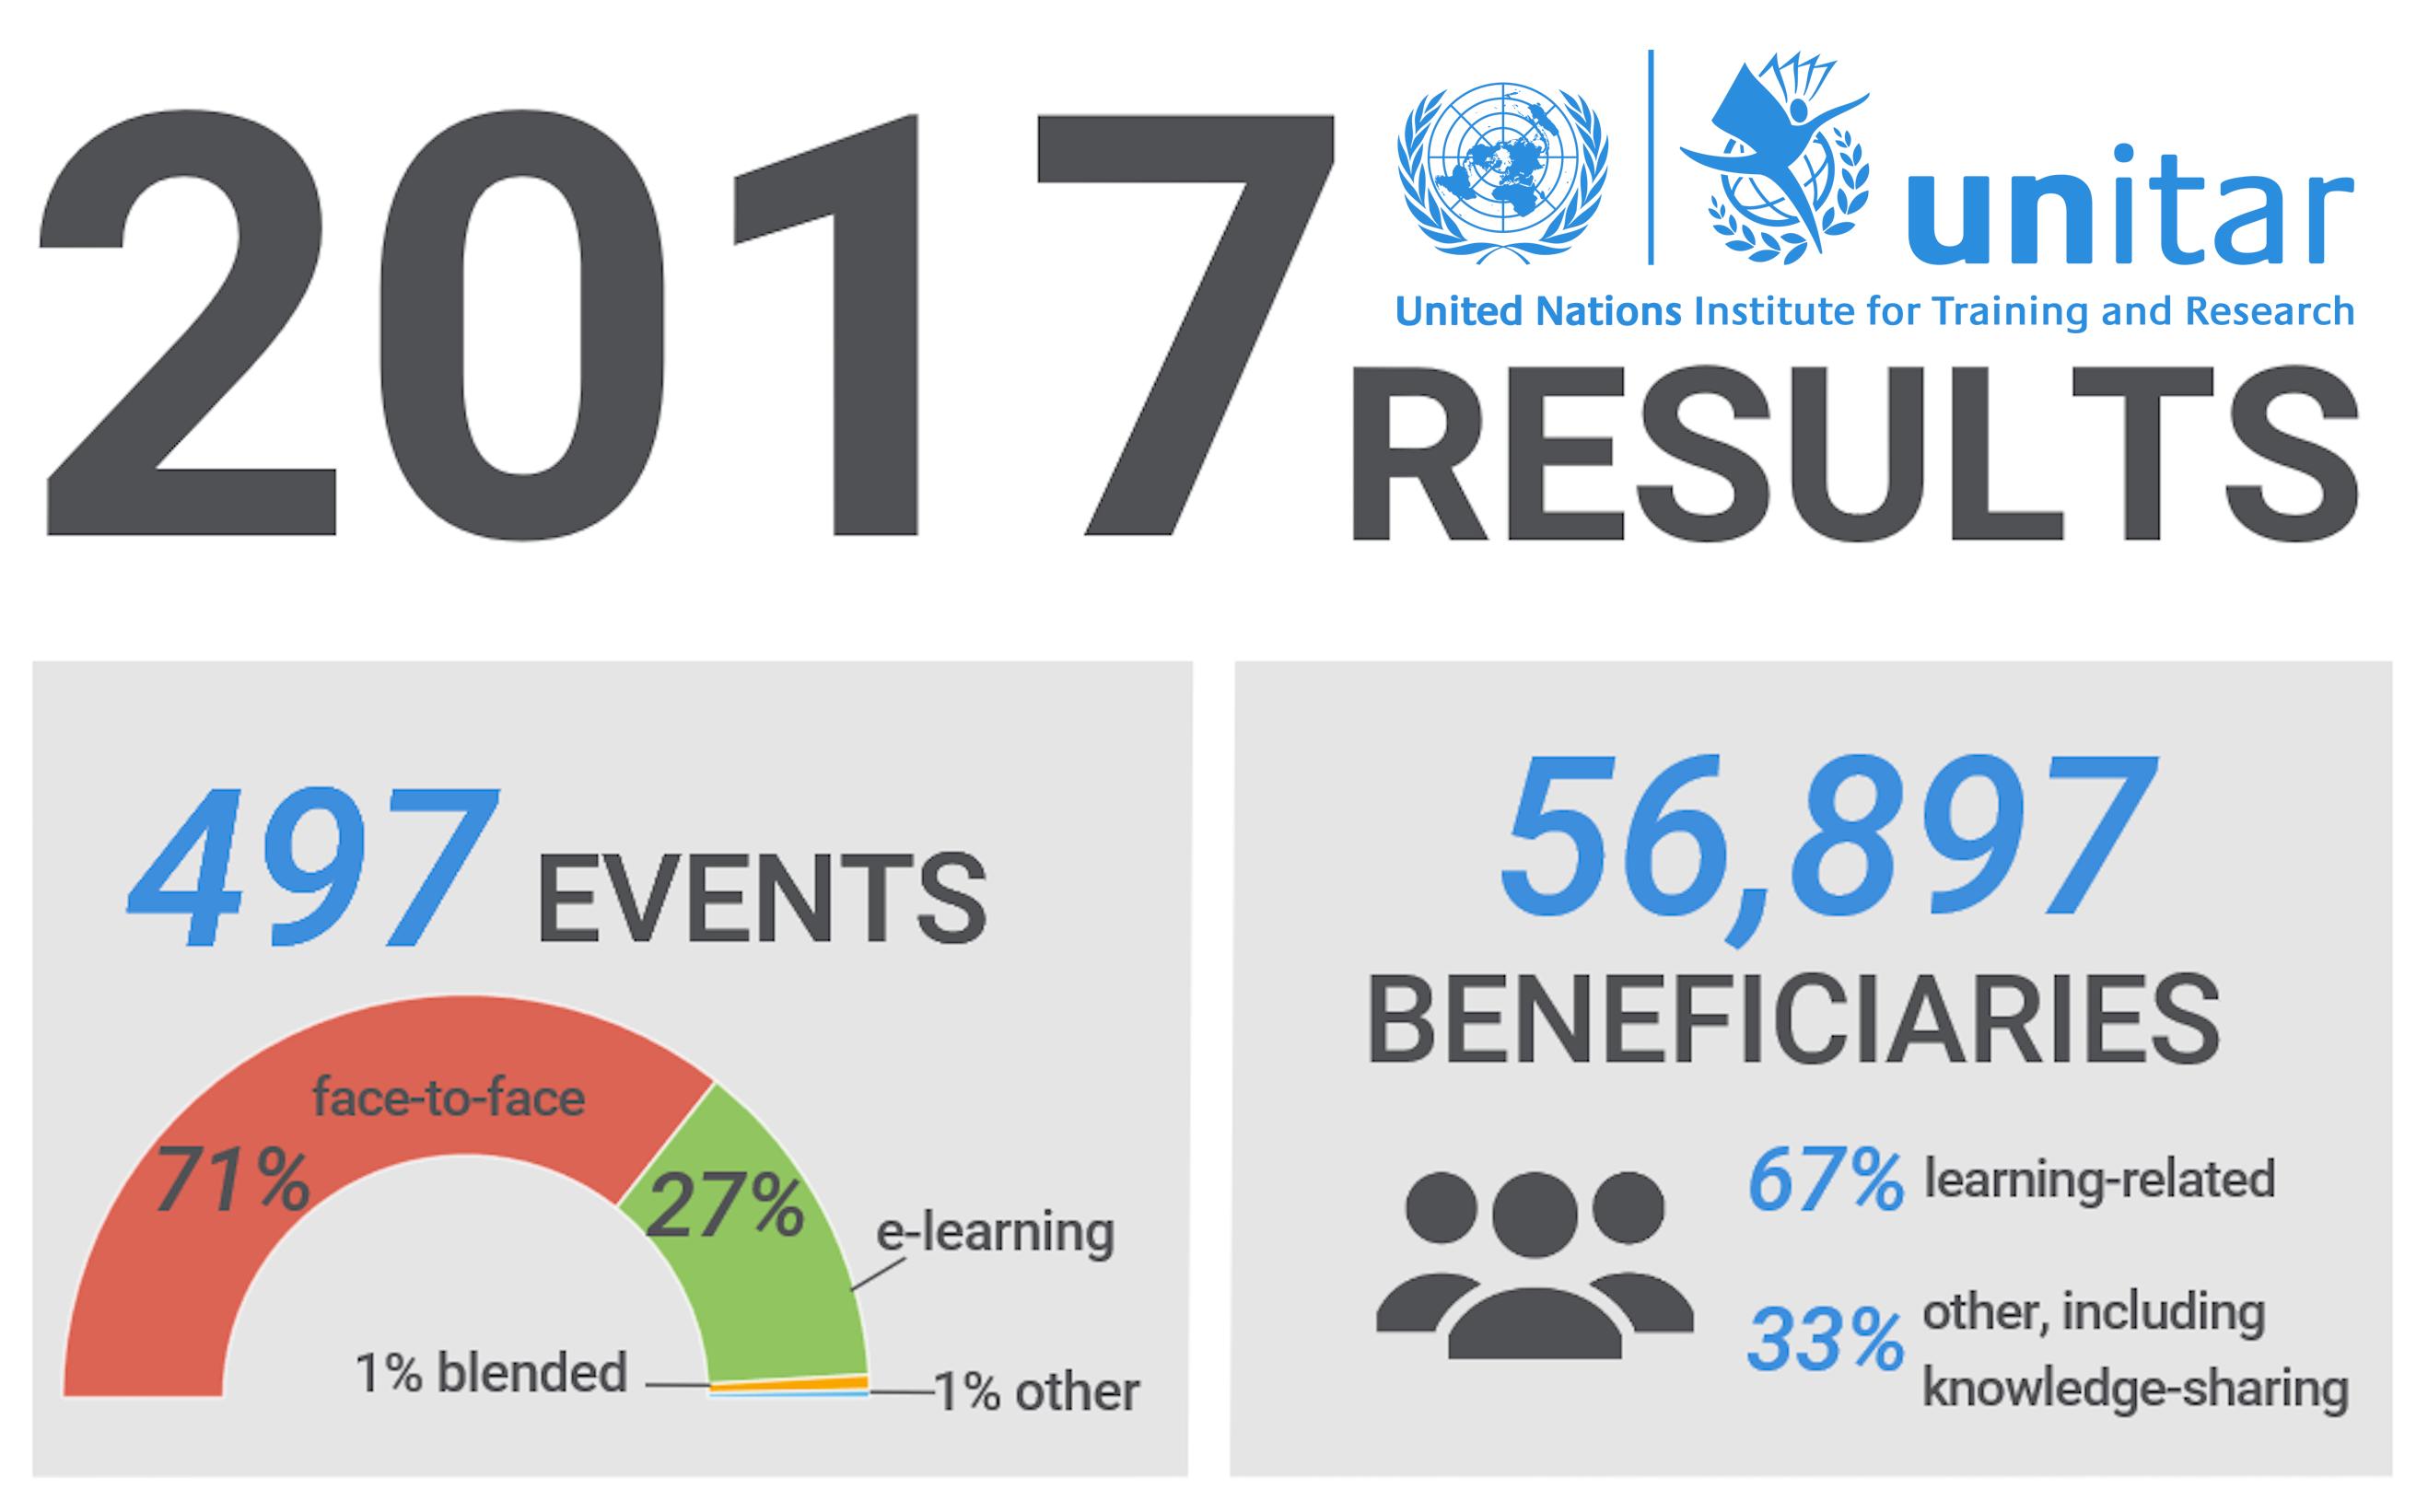 UNITAR results 2017